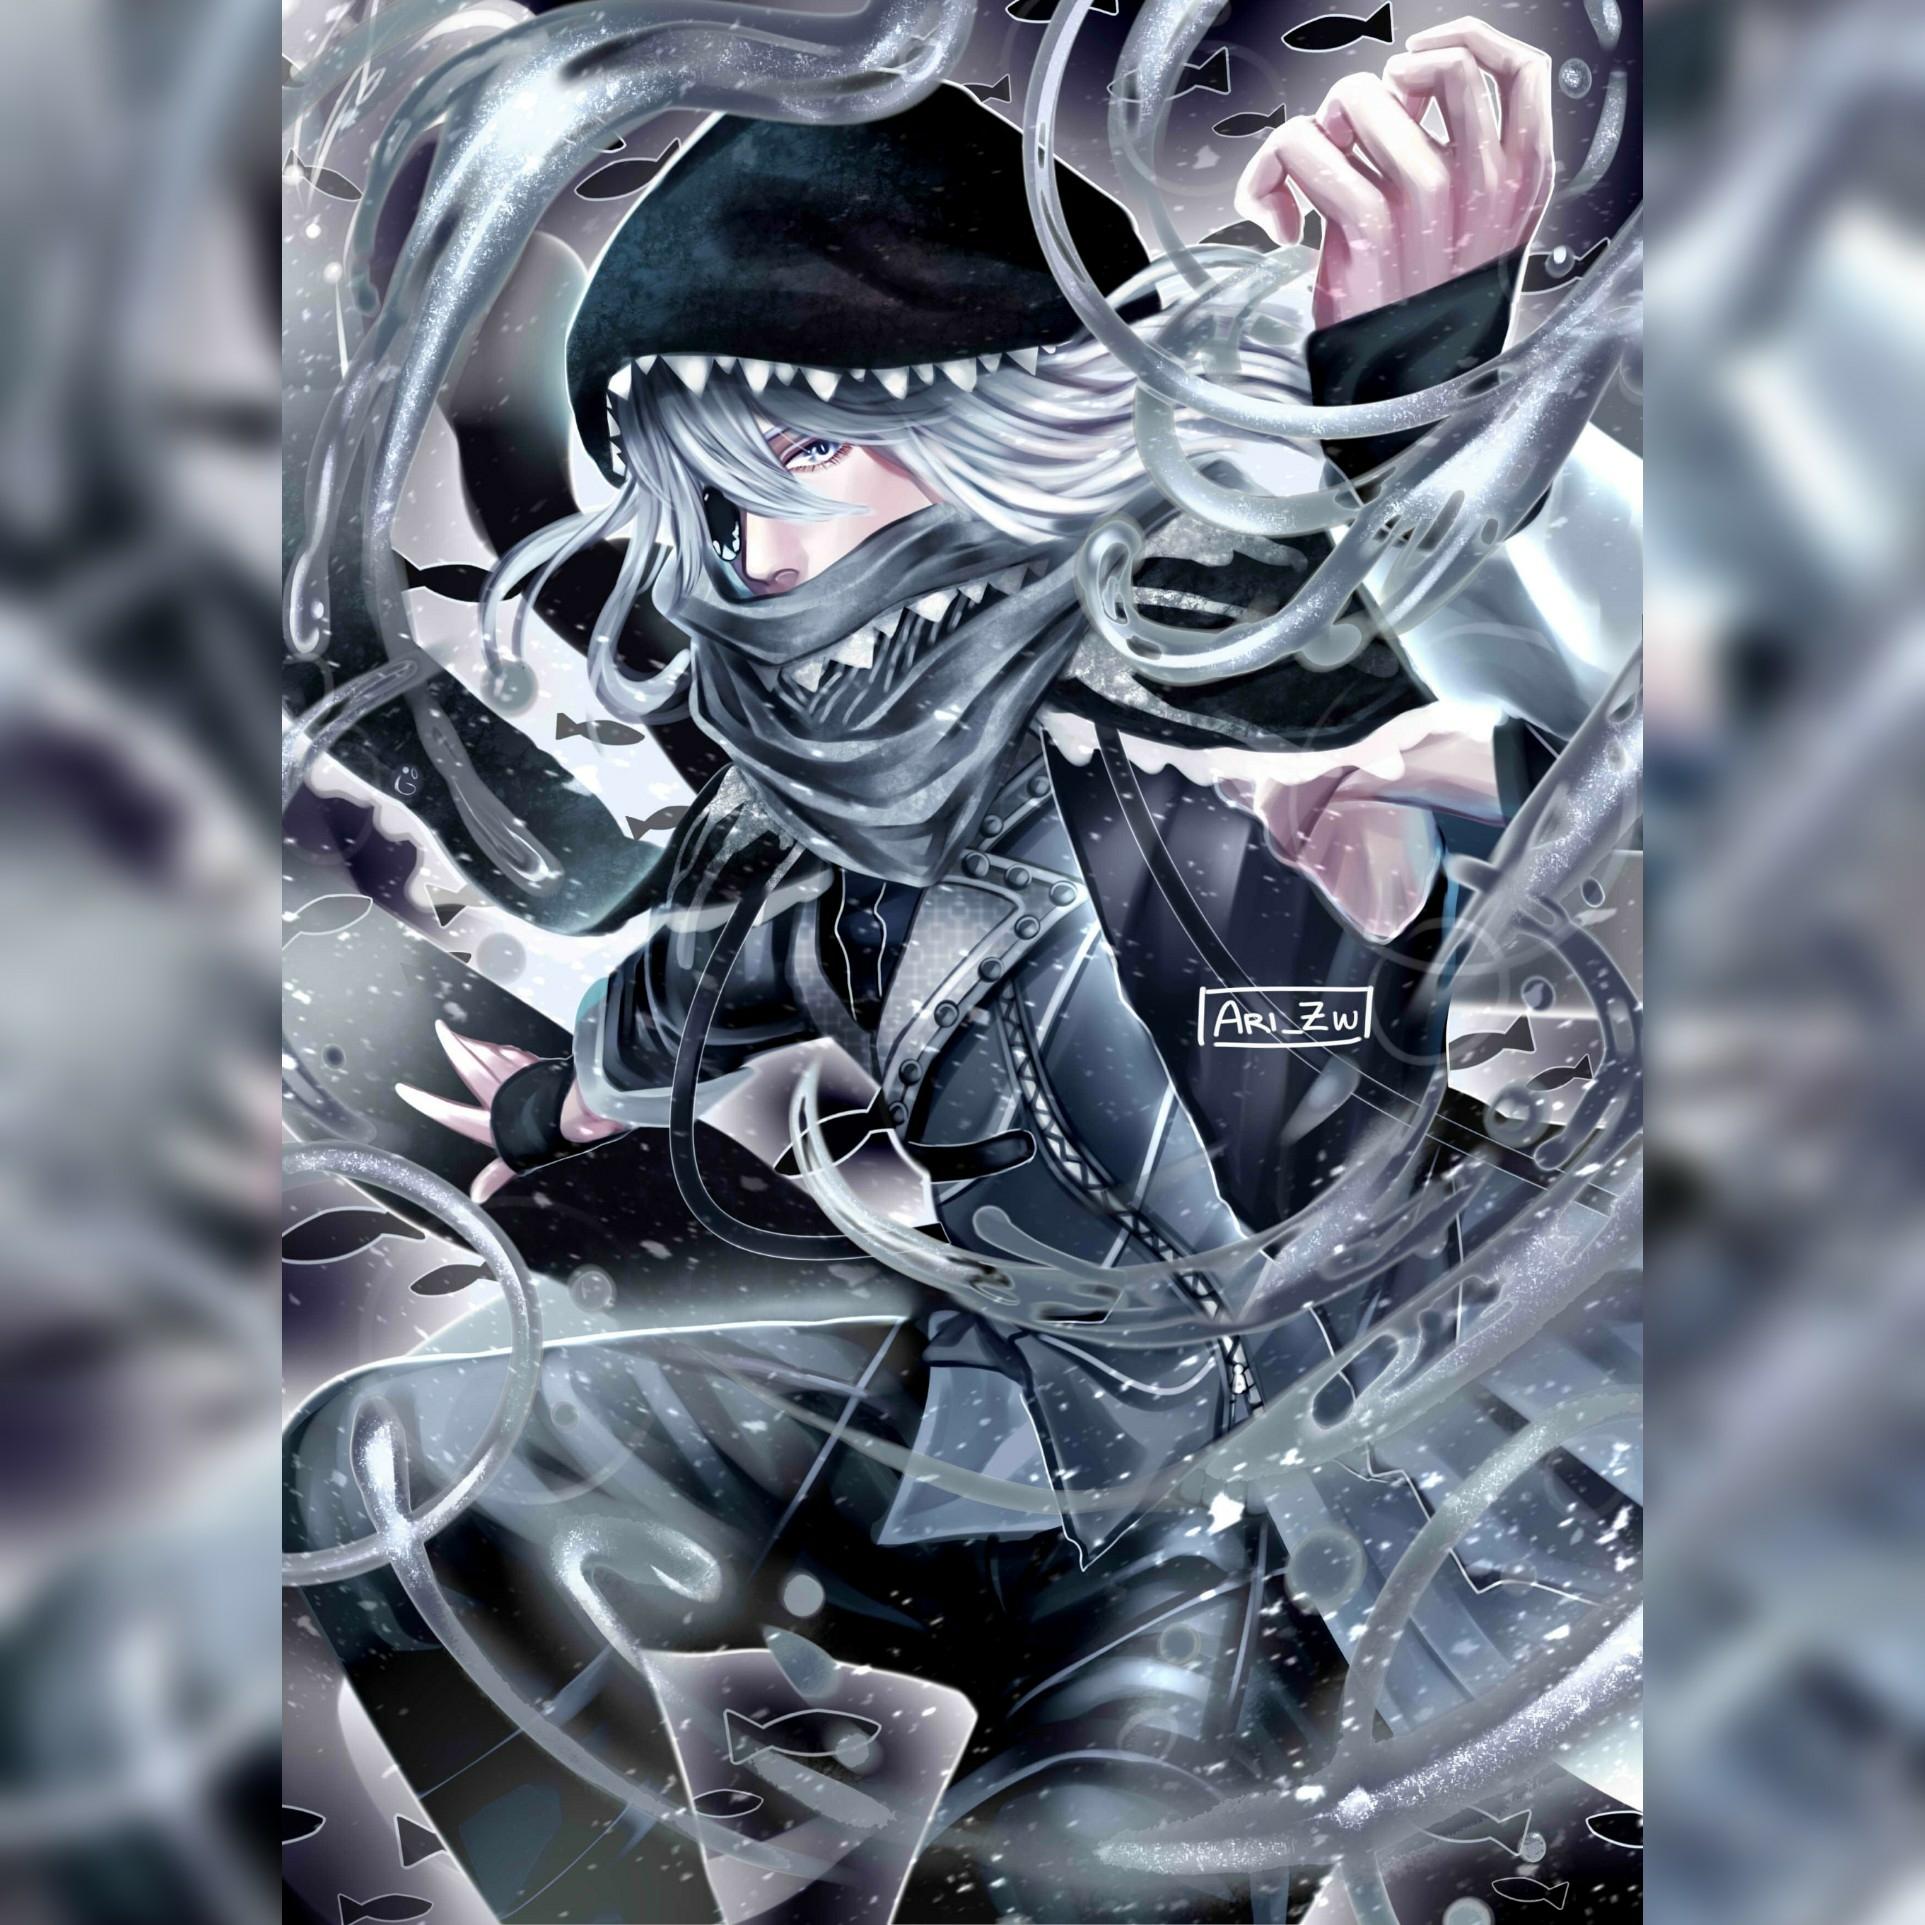 Caviar (food Fantasy) Image #2439374 - Zerochan Anime Image